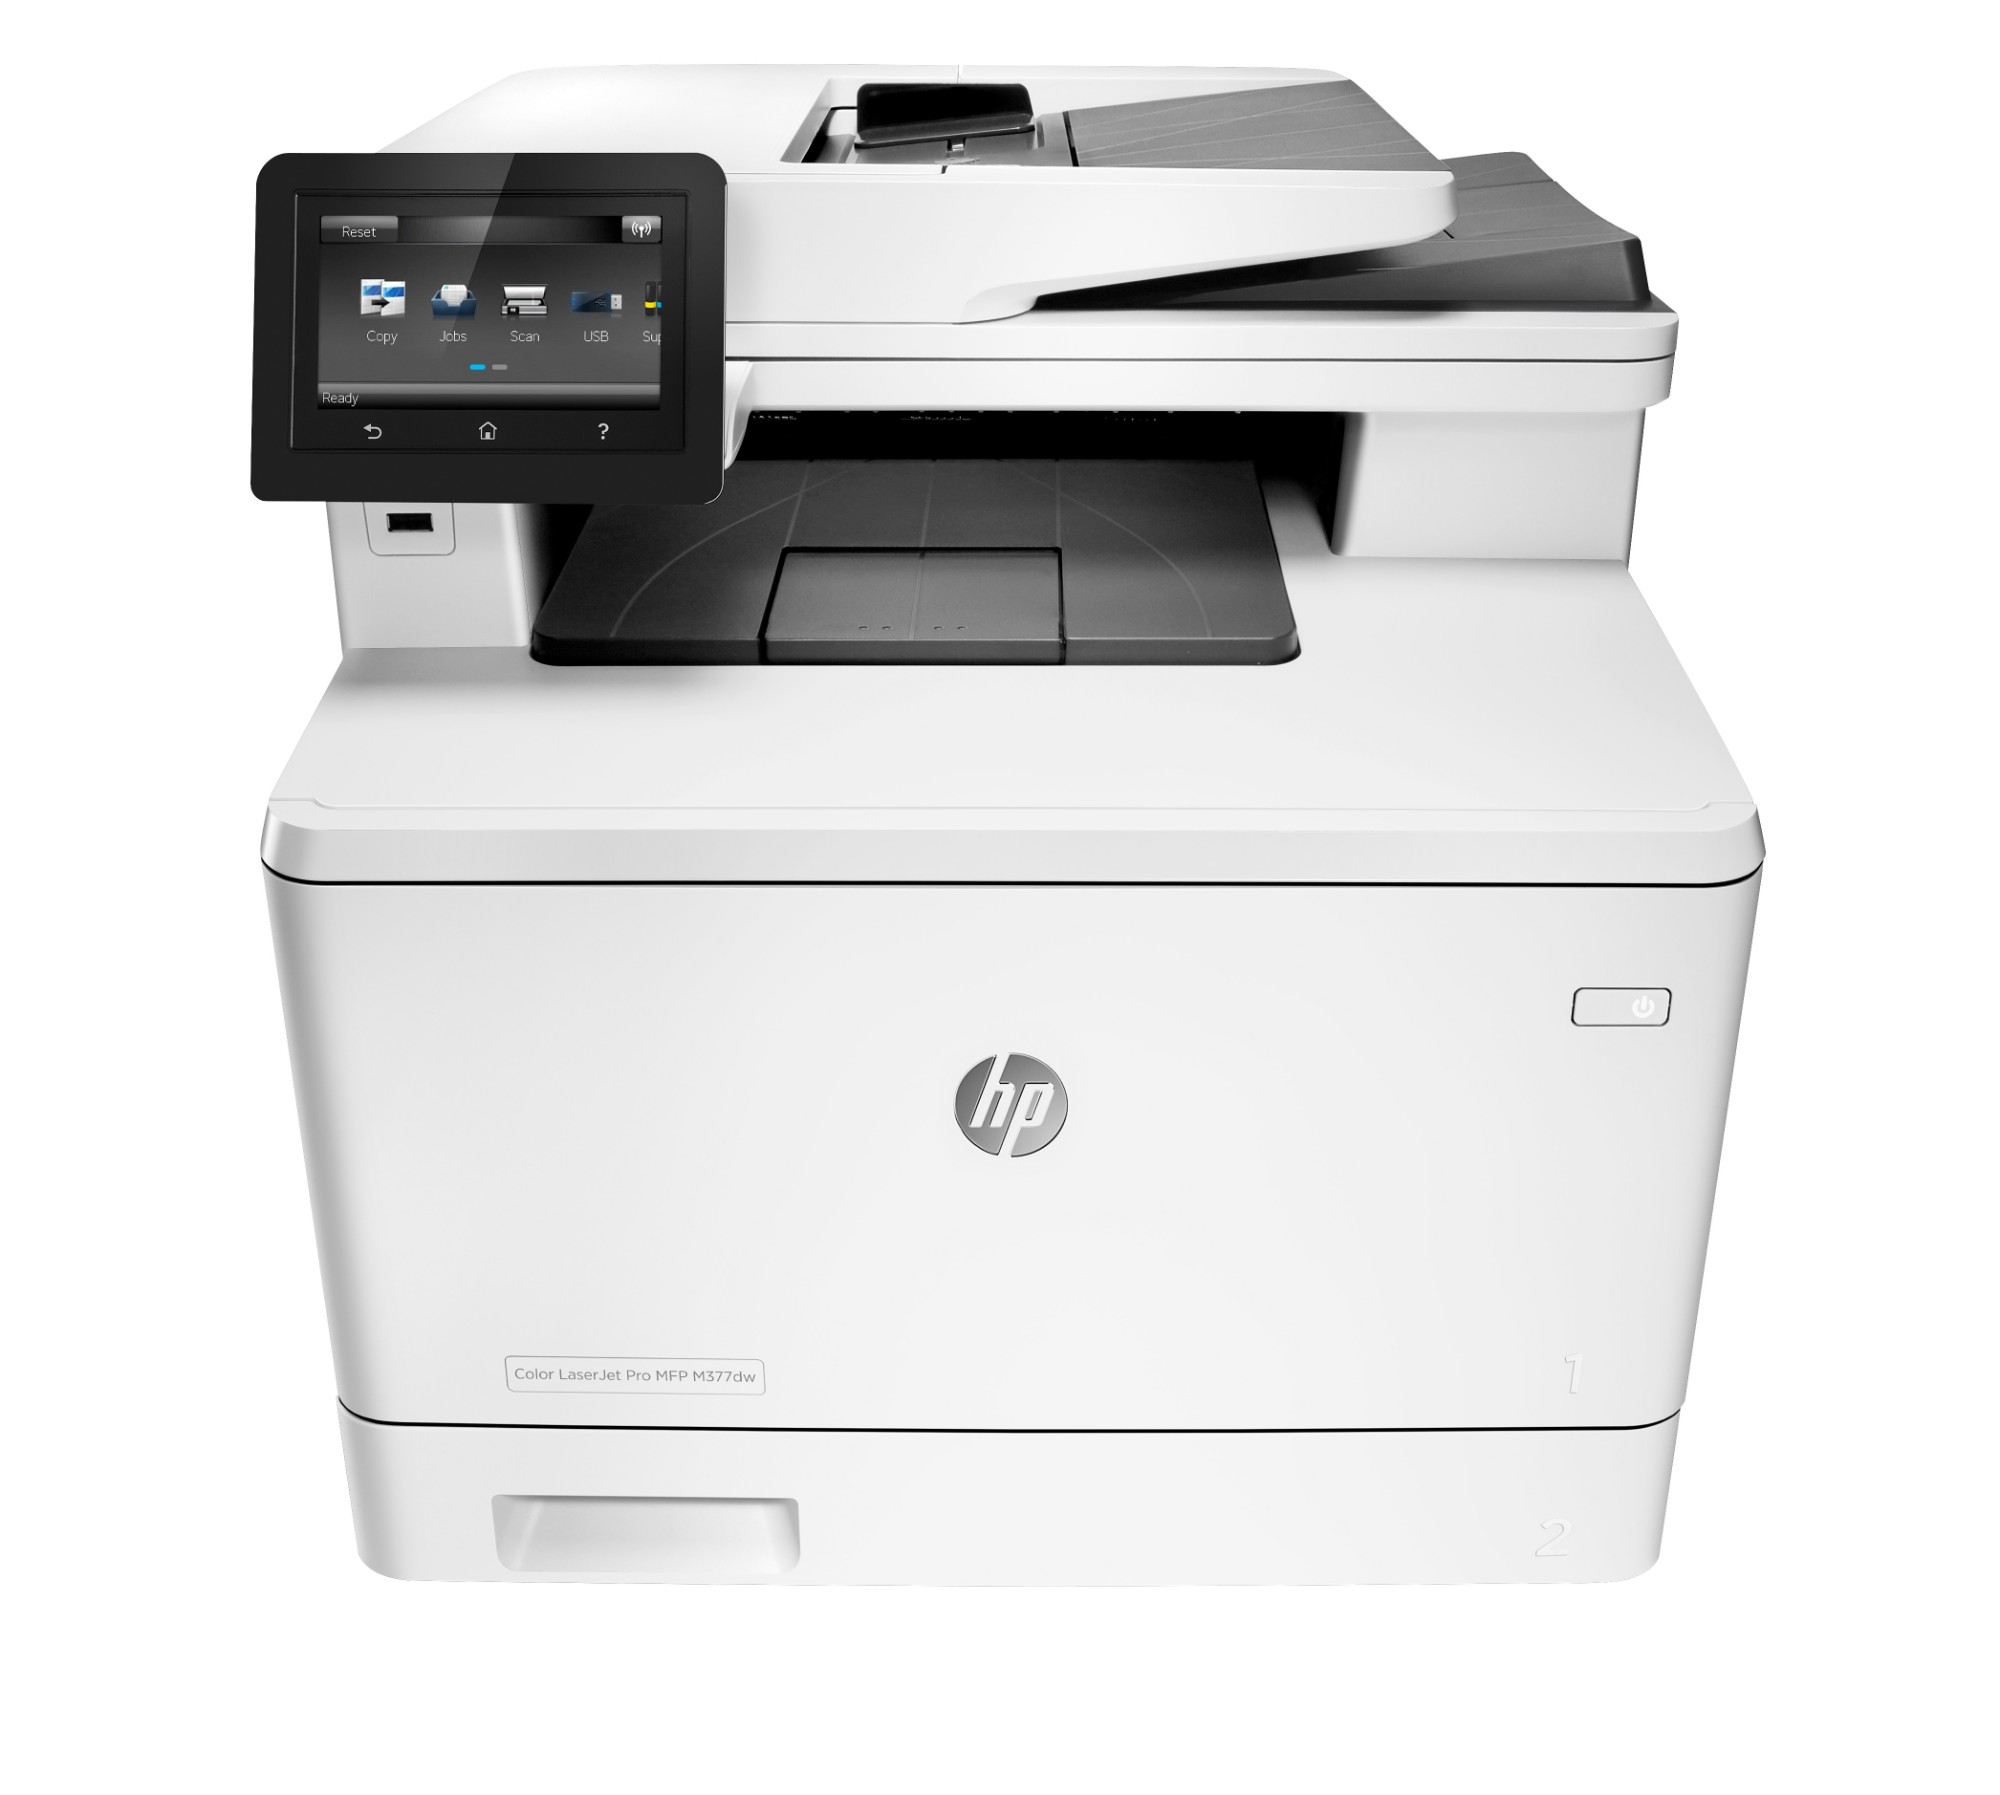 HP LaserJet Pro M377dw Laser 24 ppm 38400 x 600 DPI A4 Wi-Fi